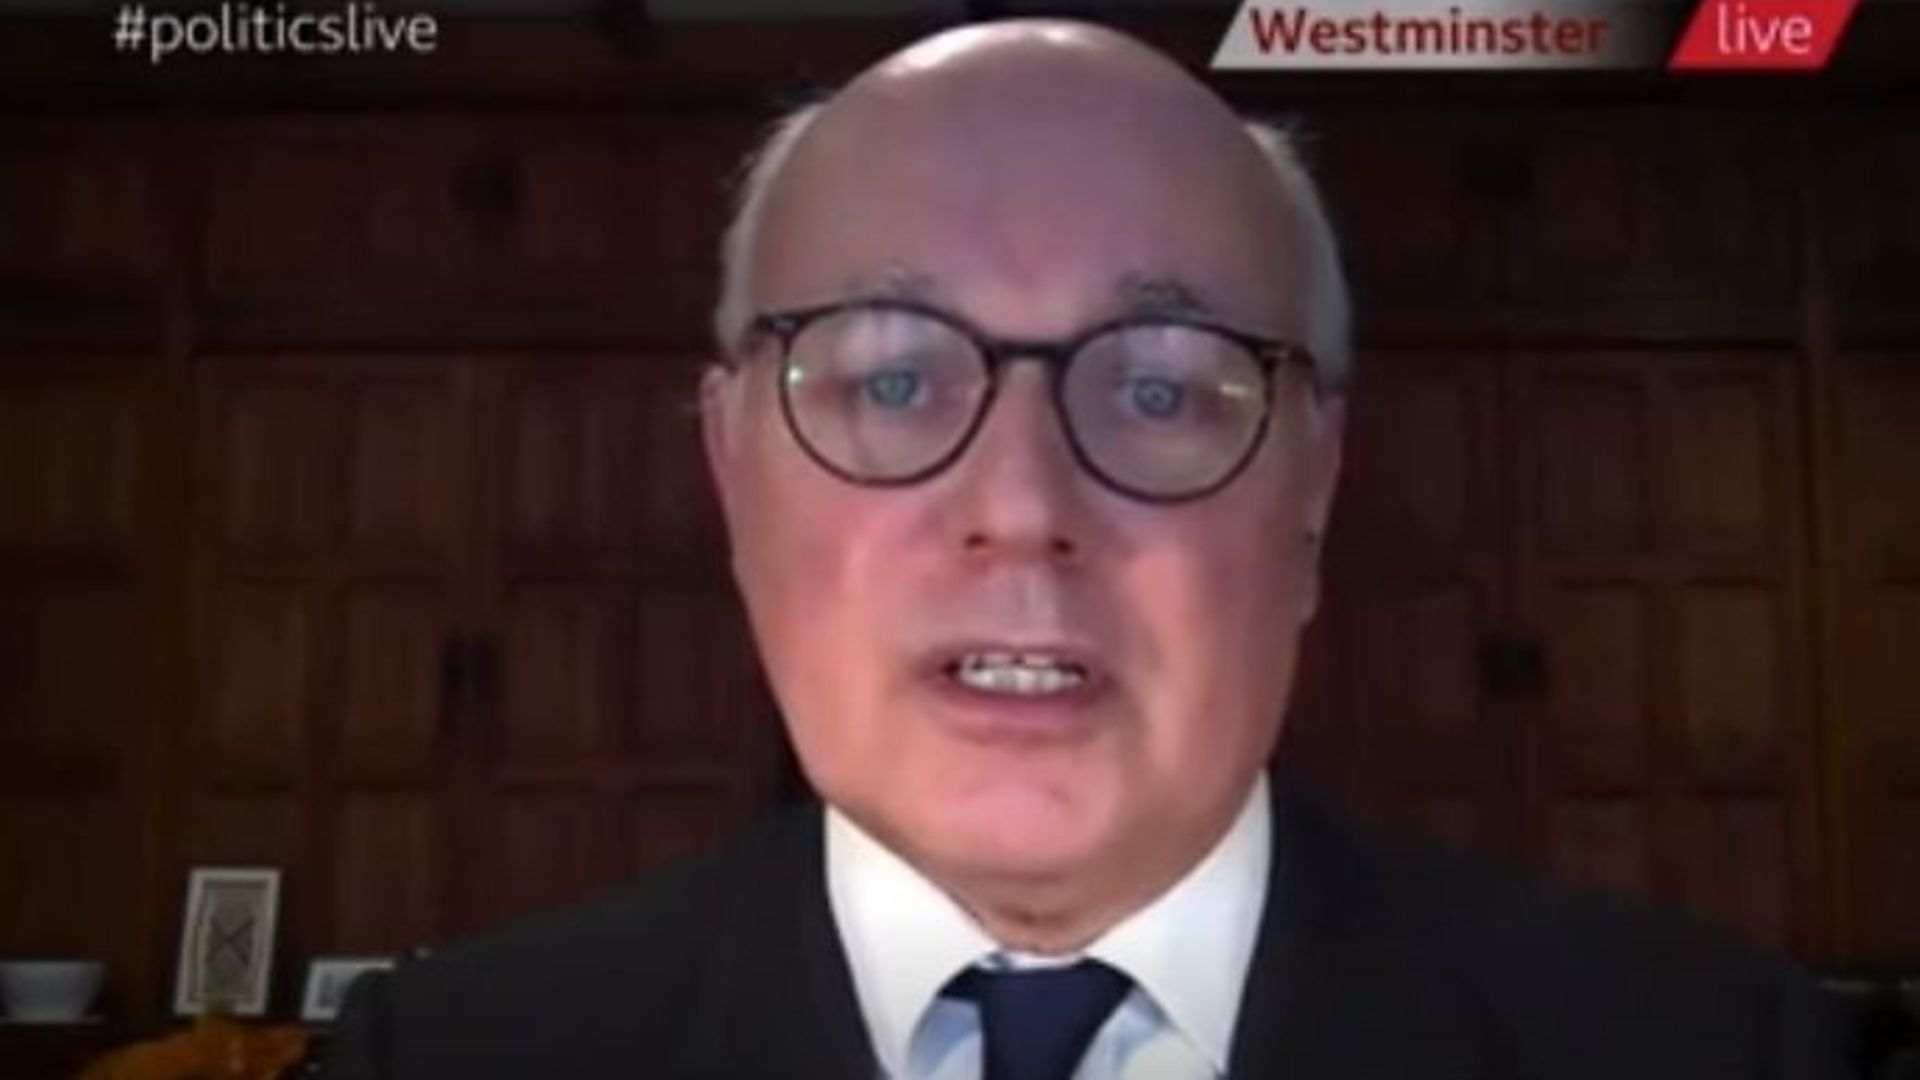 Iain Duncan Smith on Politics Live - Credit: BBC